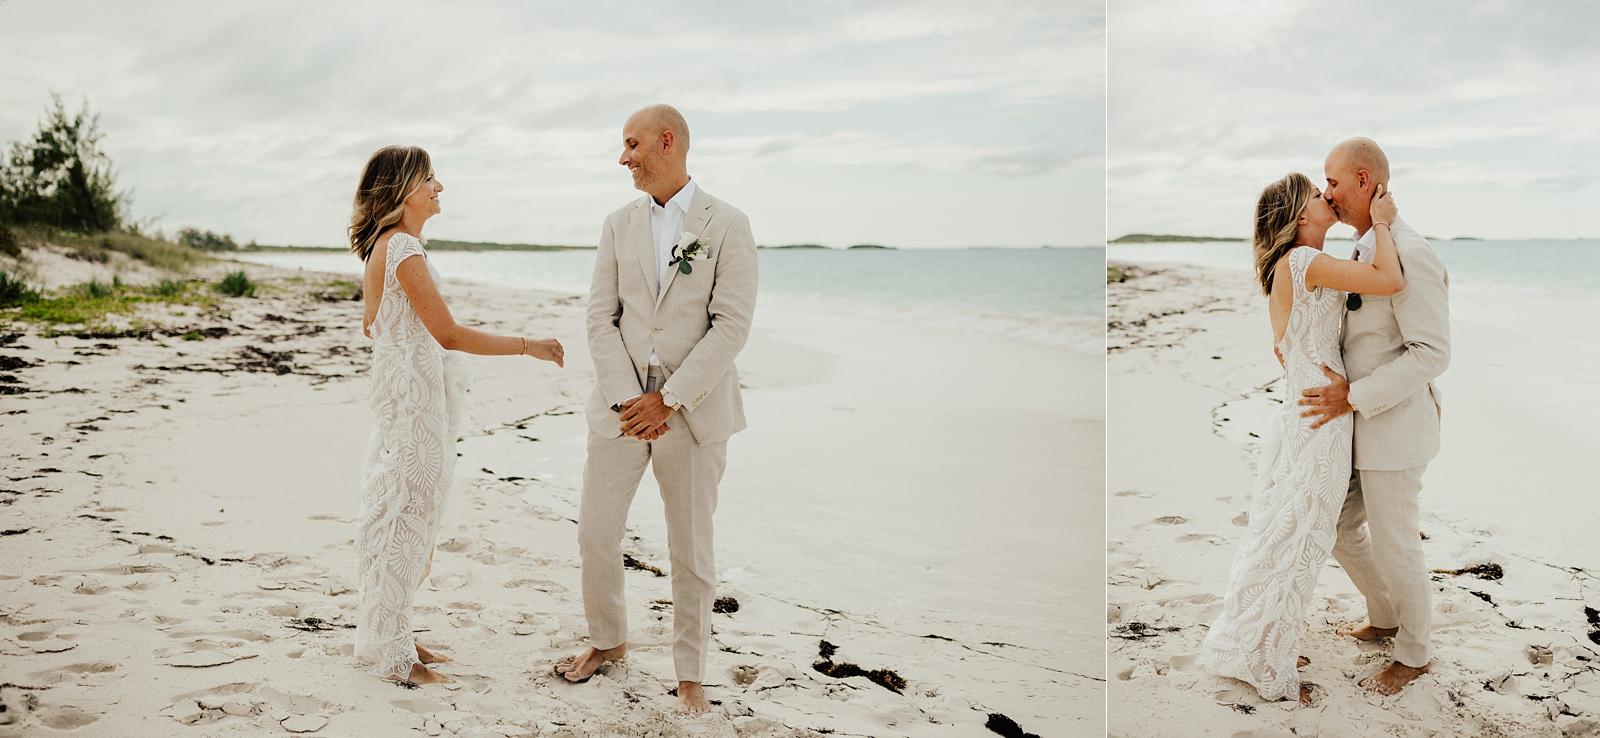 Jenni & Andrew Intimate Beach Destination Wedding in Little Exuma, Bahamas_0486.jpg